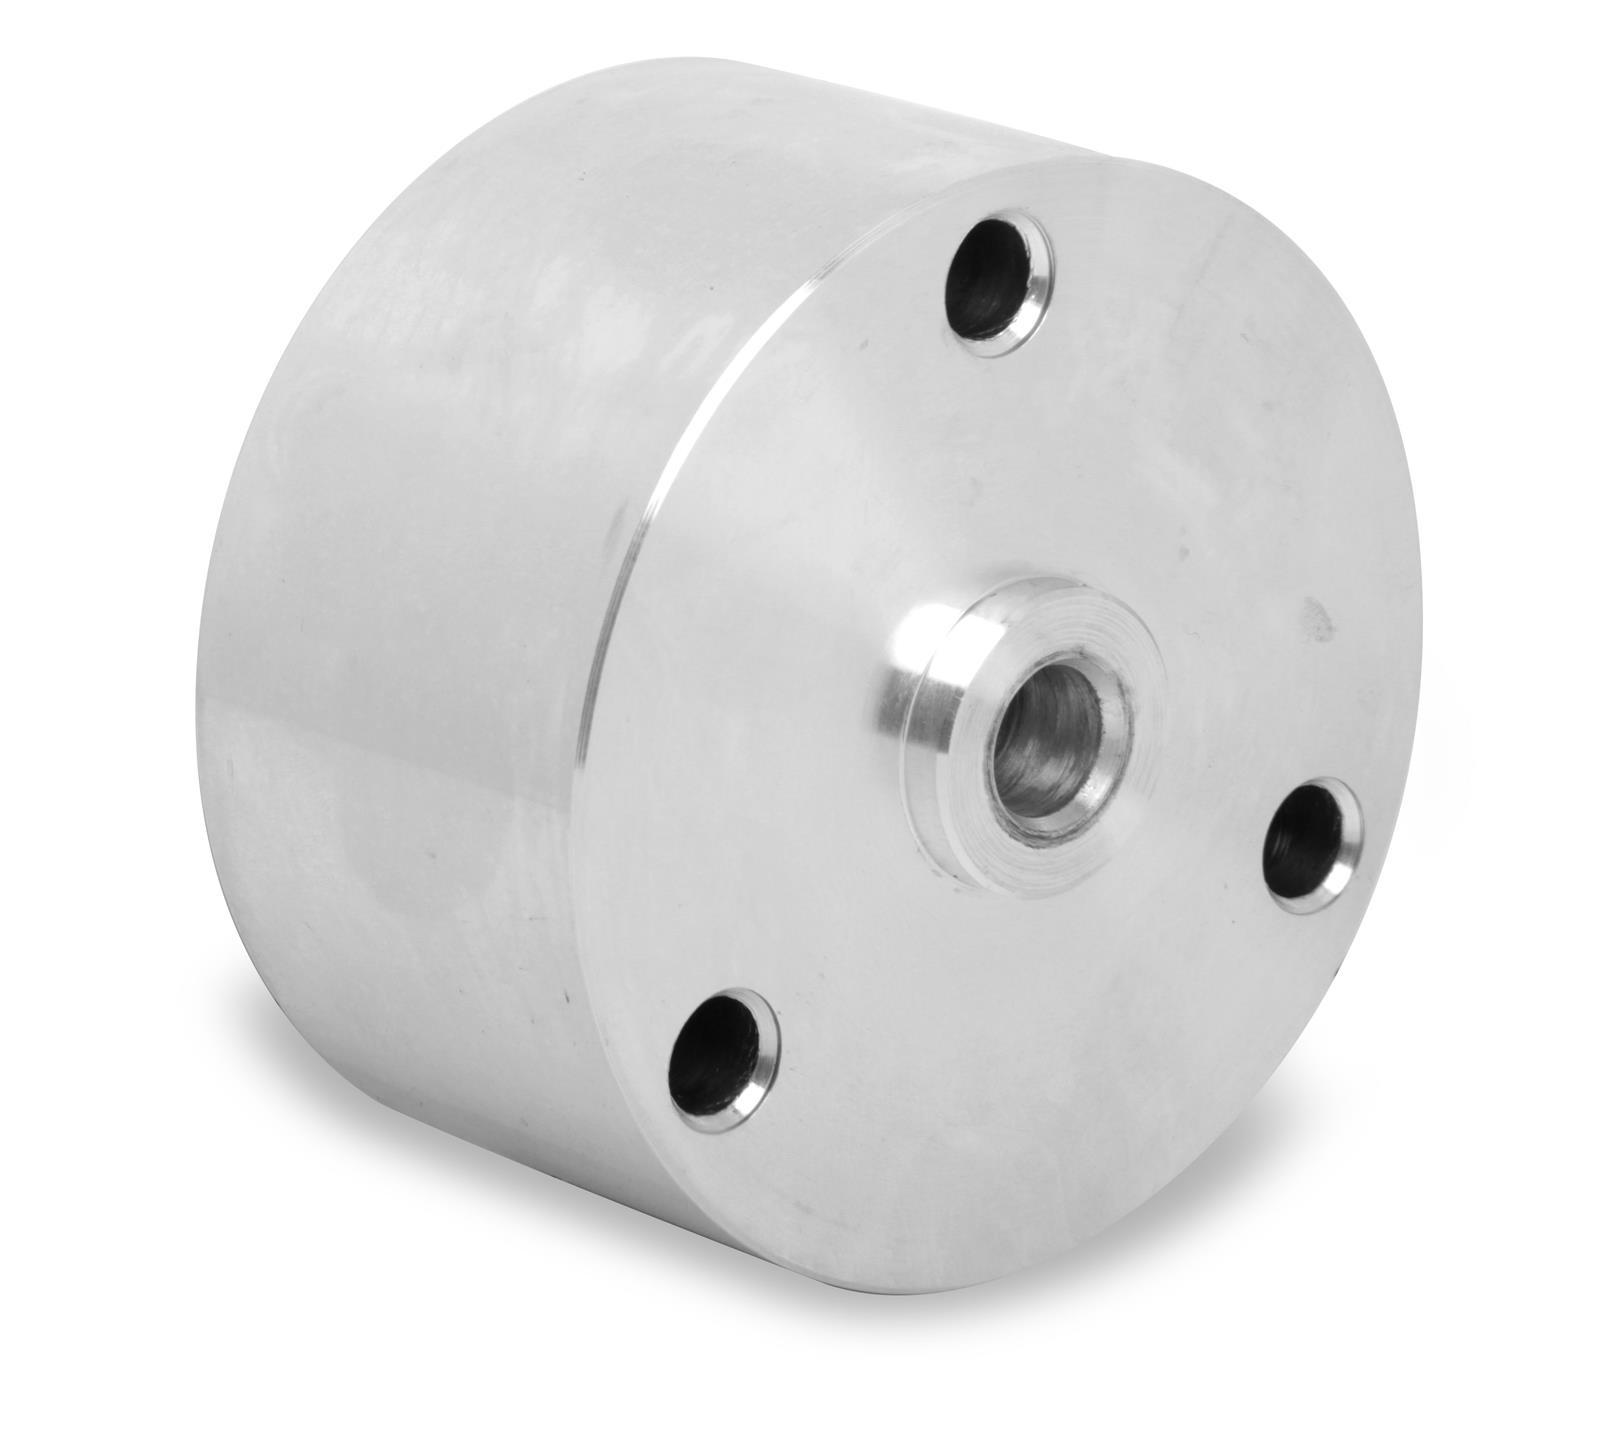 Weiand Spacer Crankshaft Puller Aluminum Chevy Weiand 144